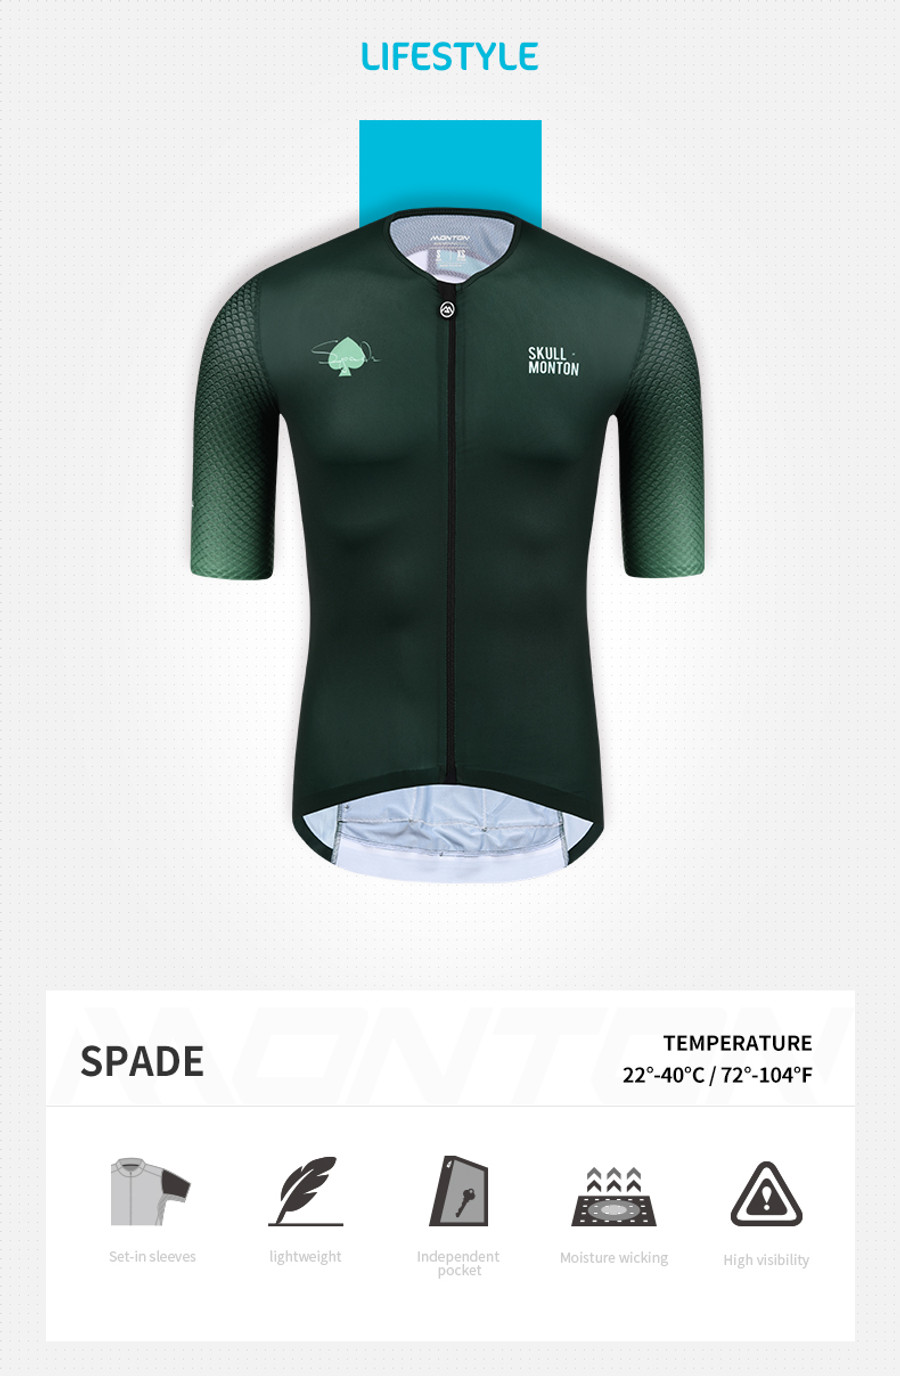 Men's Lifestyle Spades Jersey